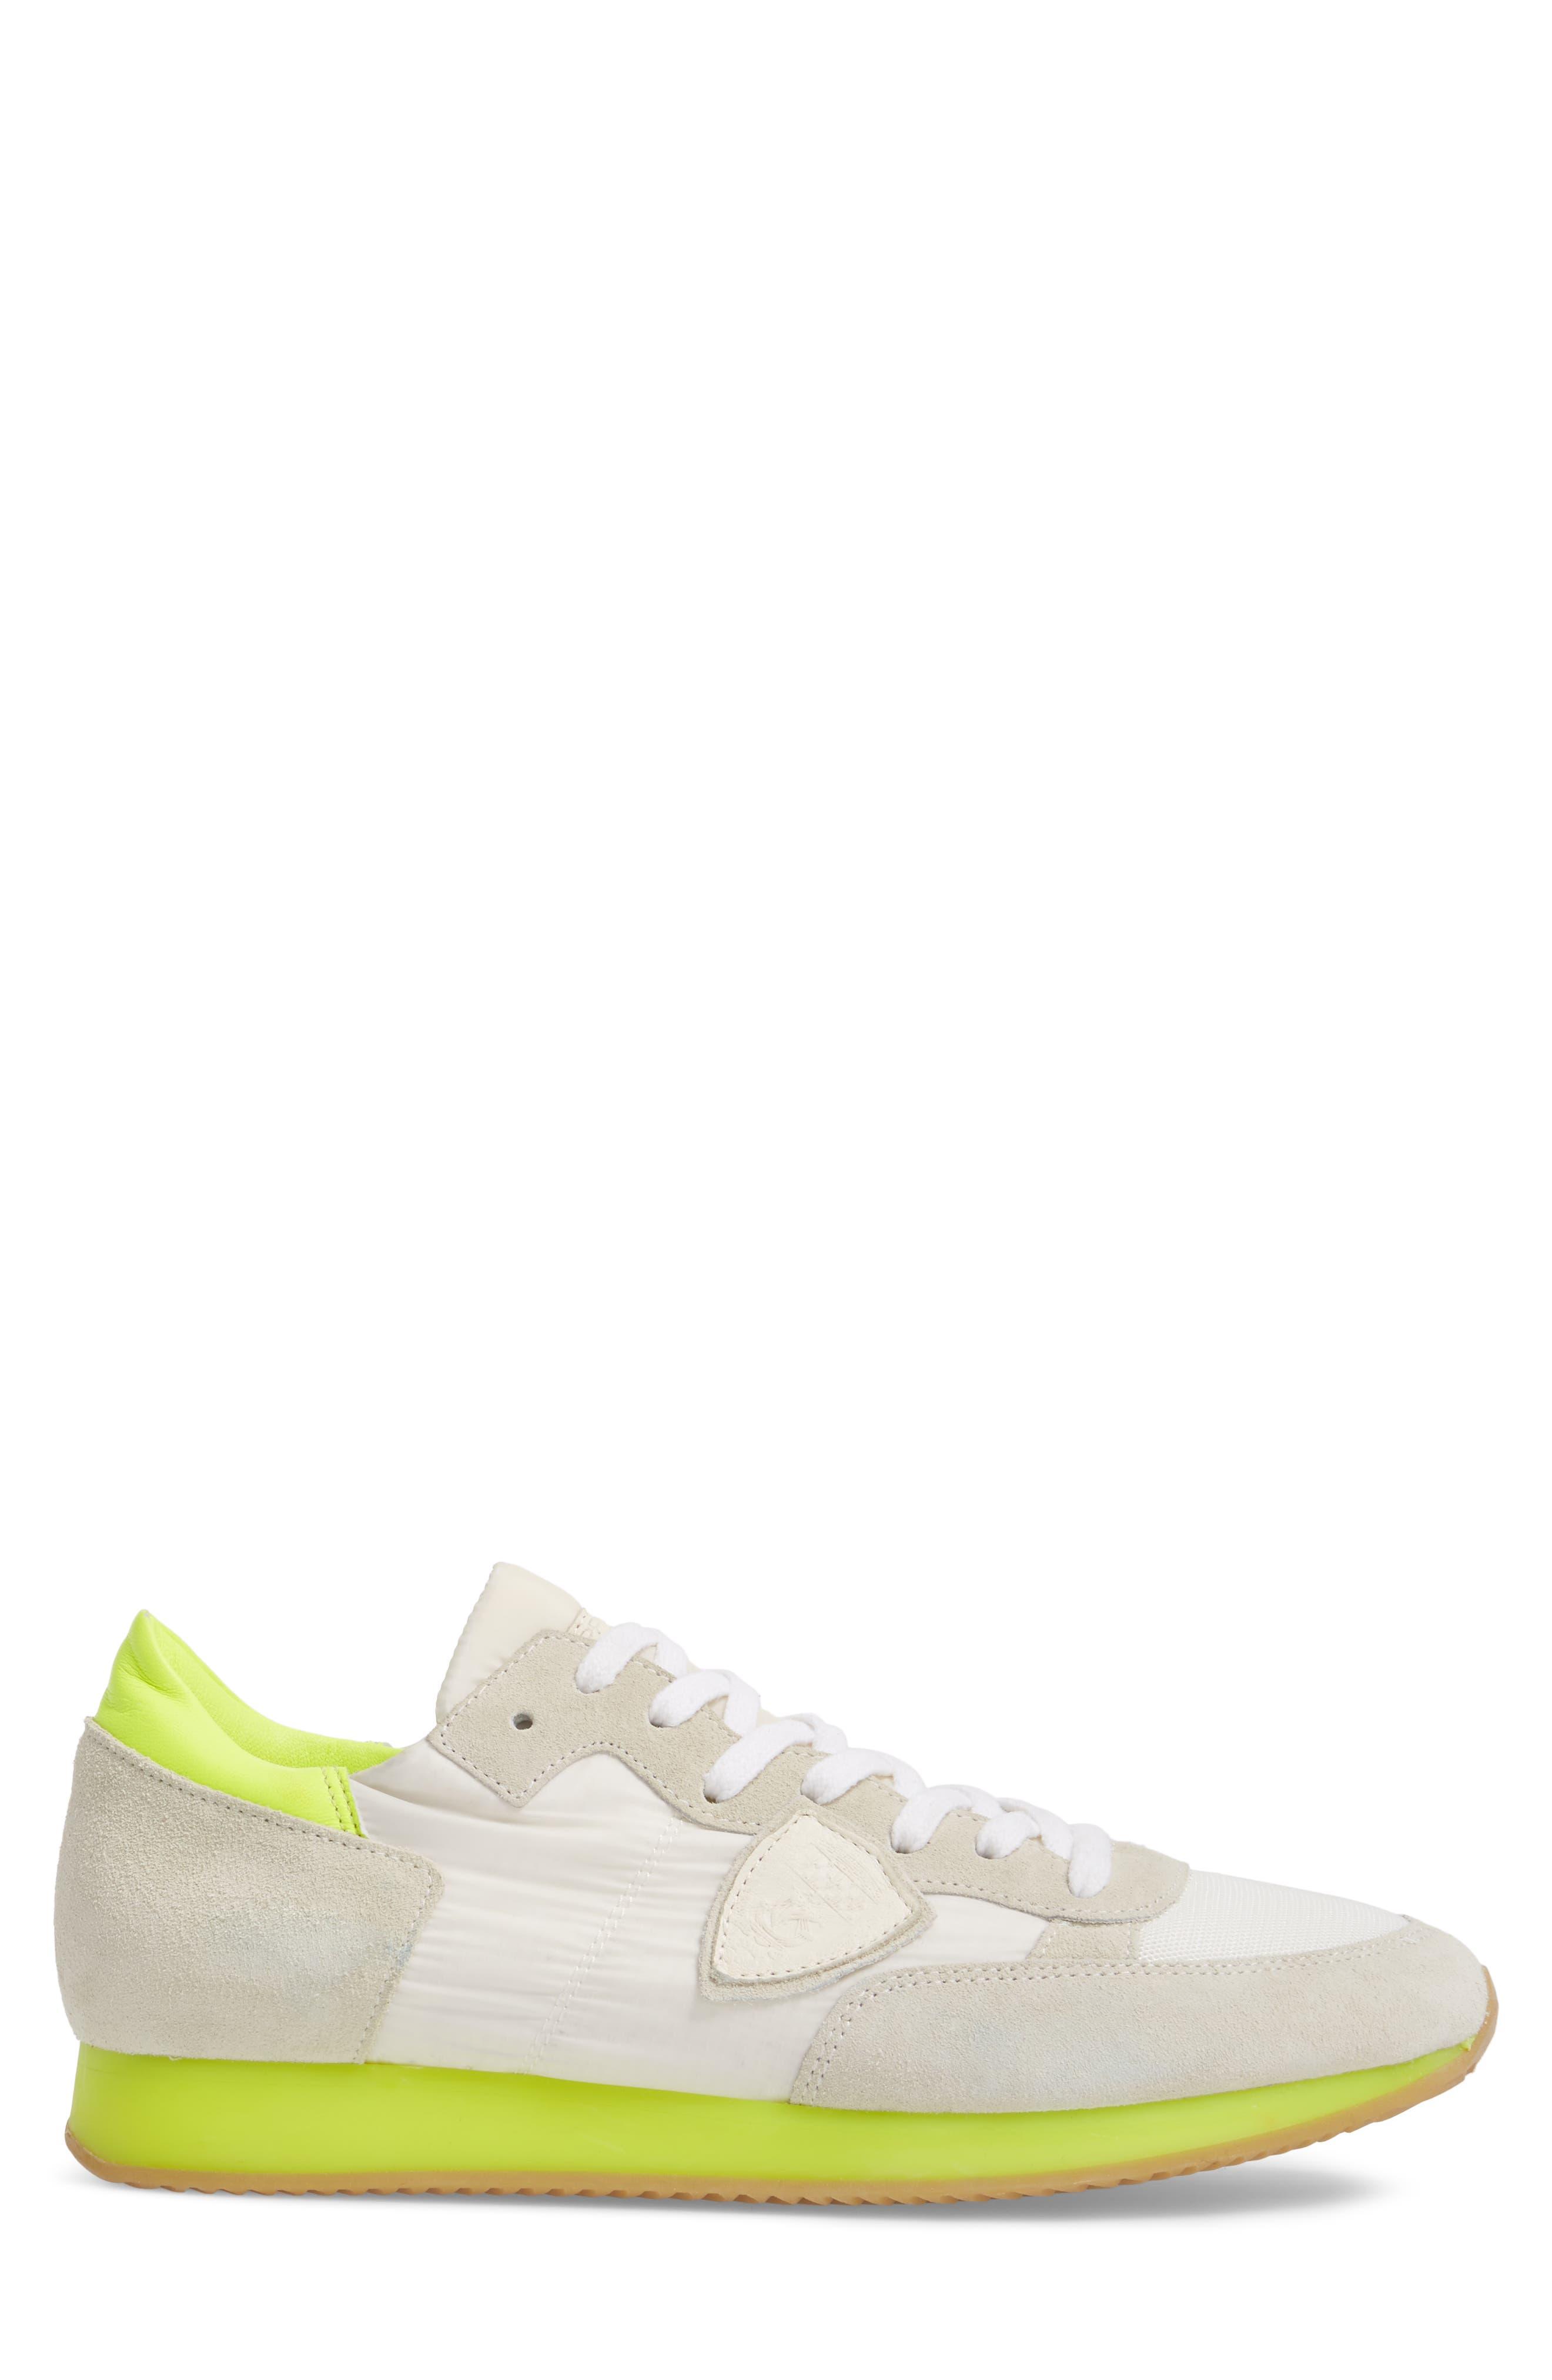 Alternate Image 3  - Philippe Model Tropez Low Top Sneaker (Men)